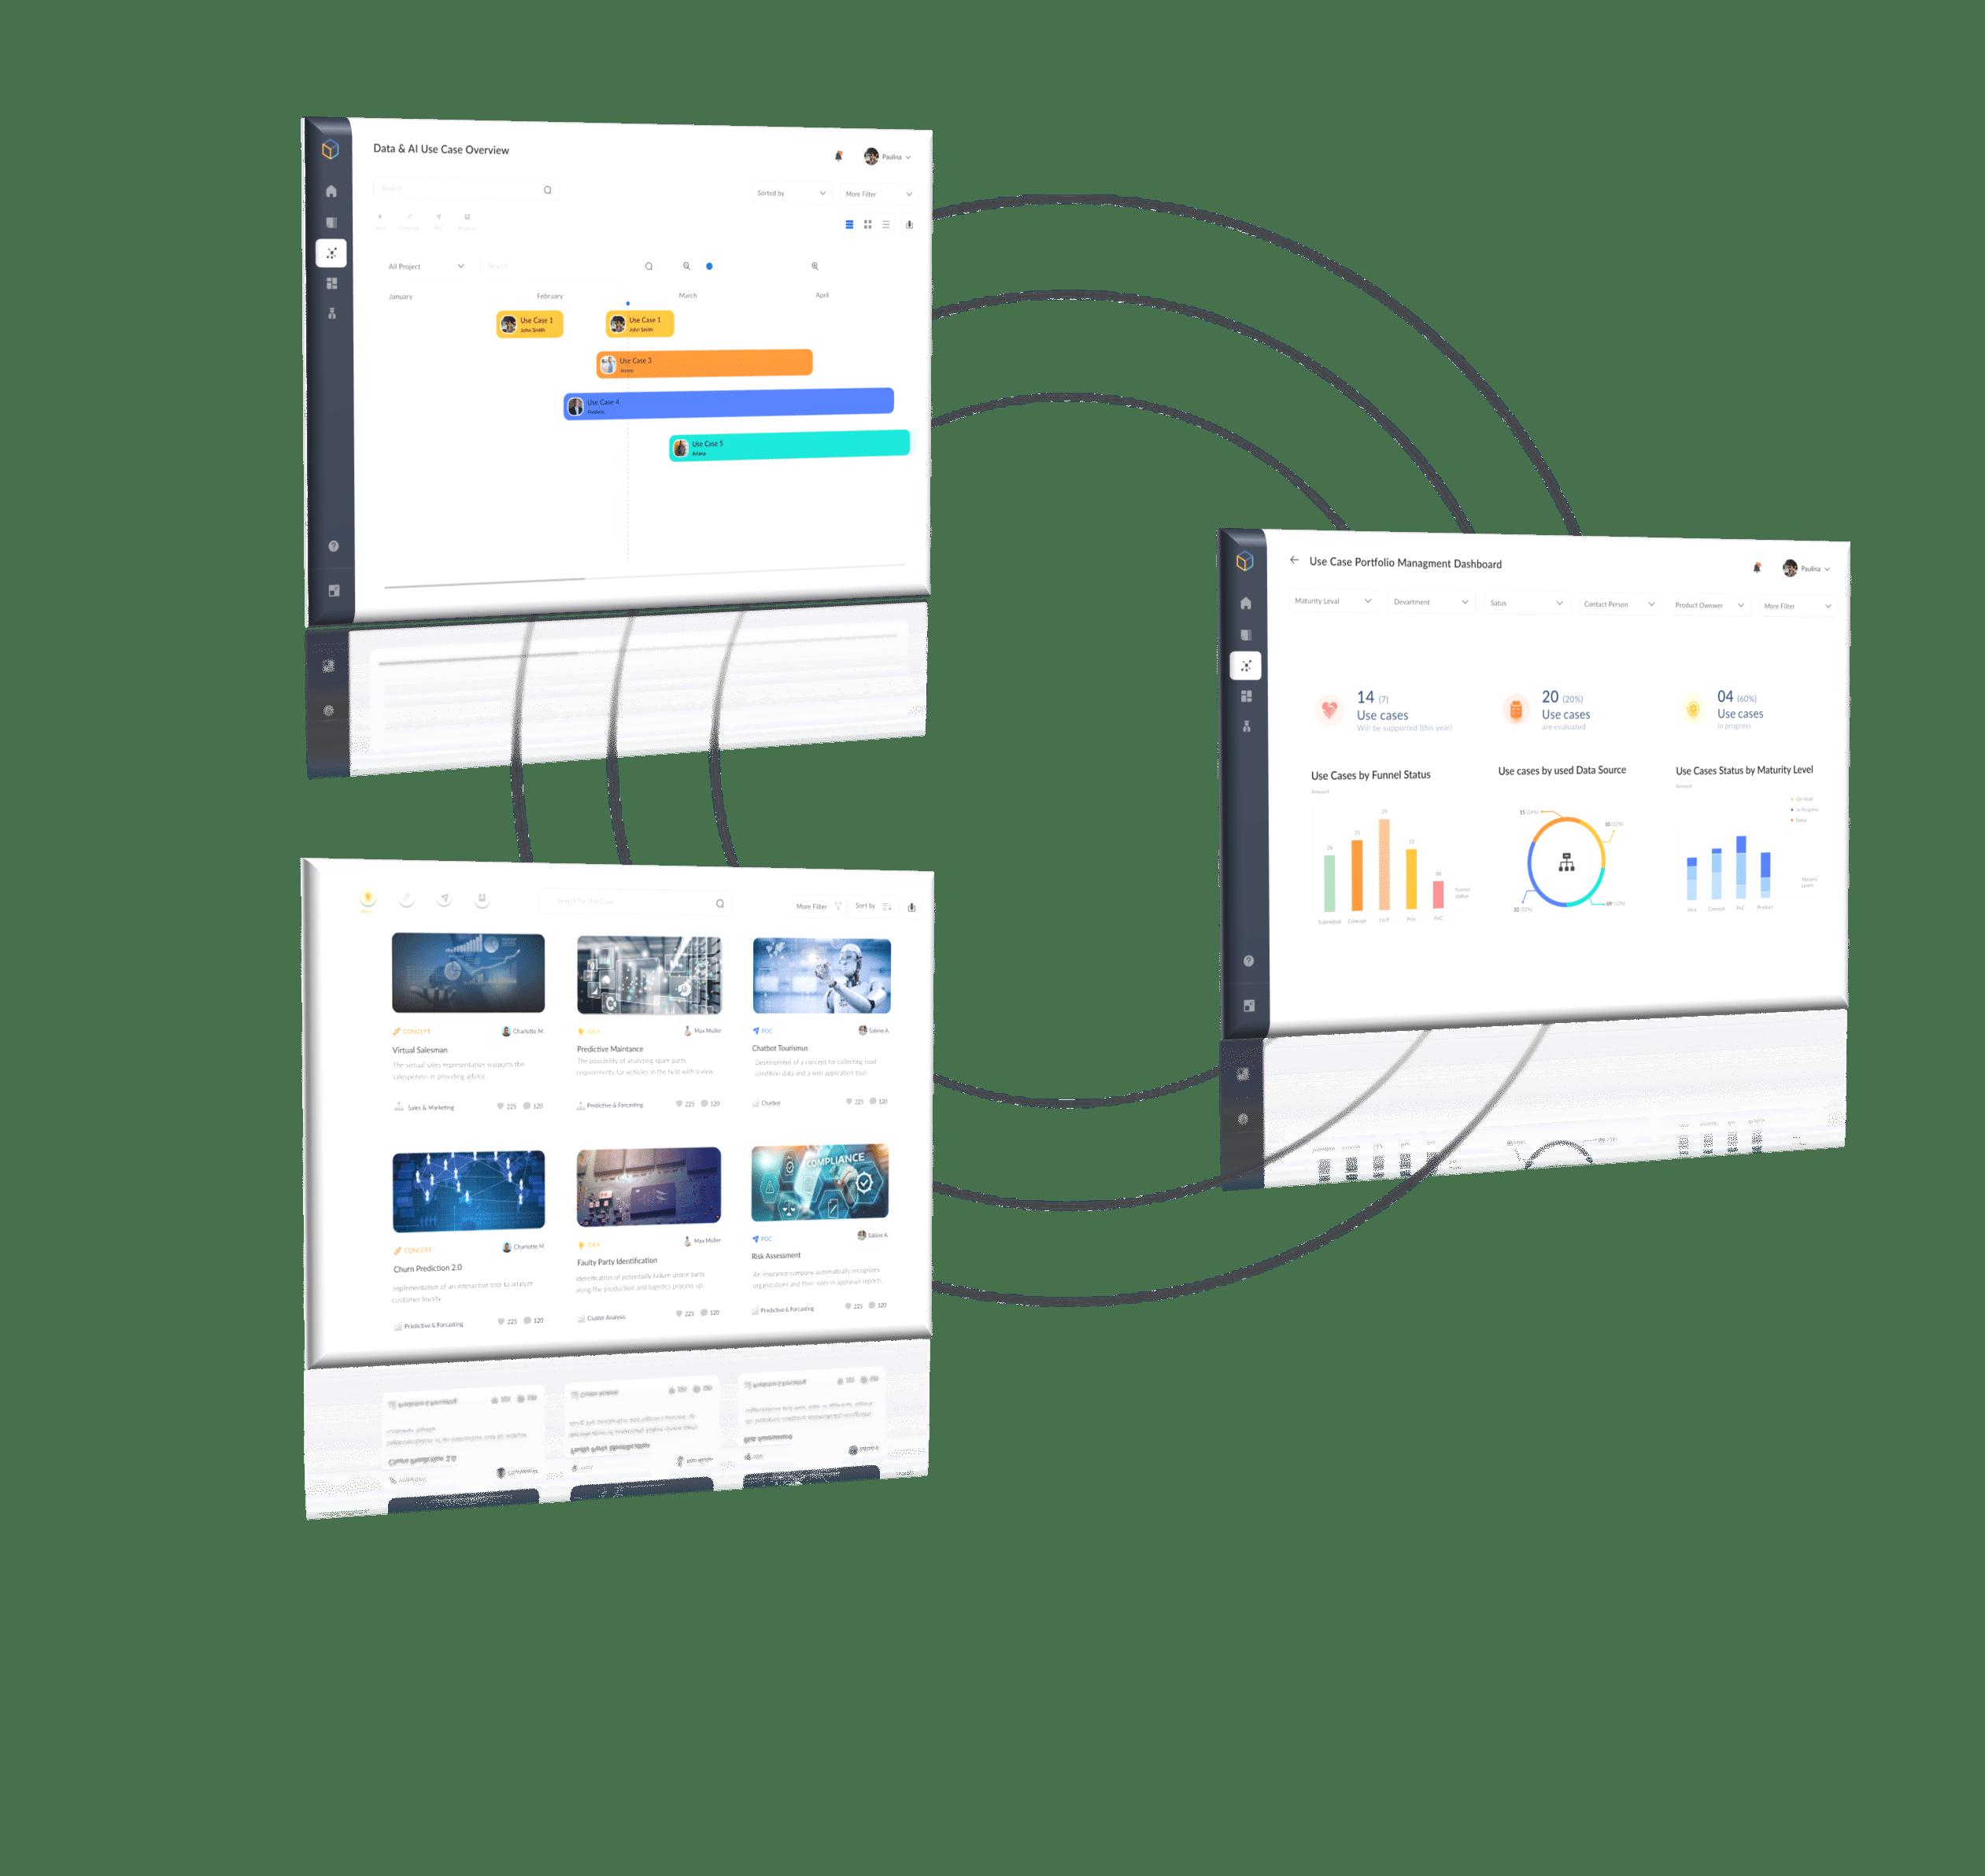 Casebase - Innovation Management Tool